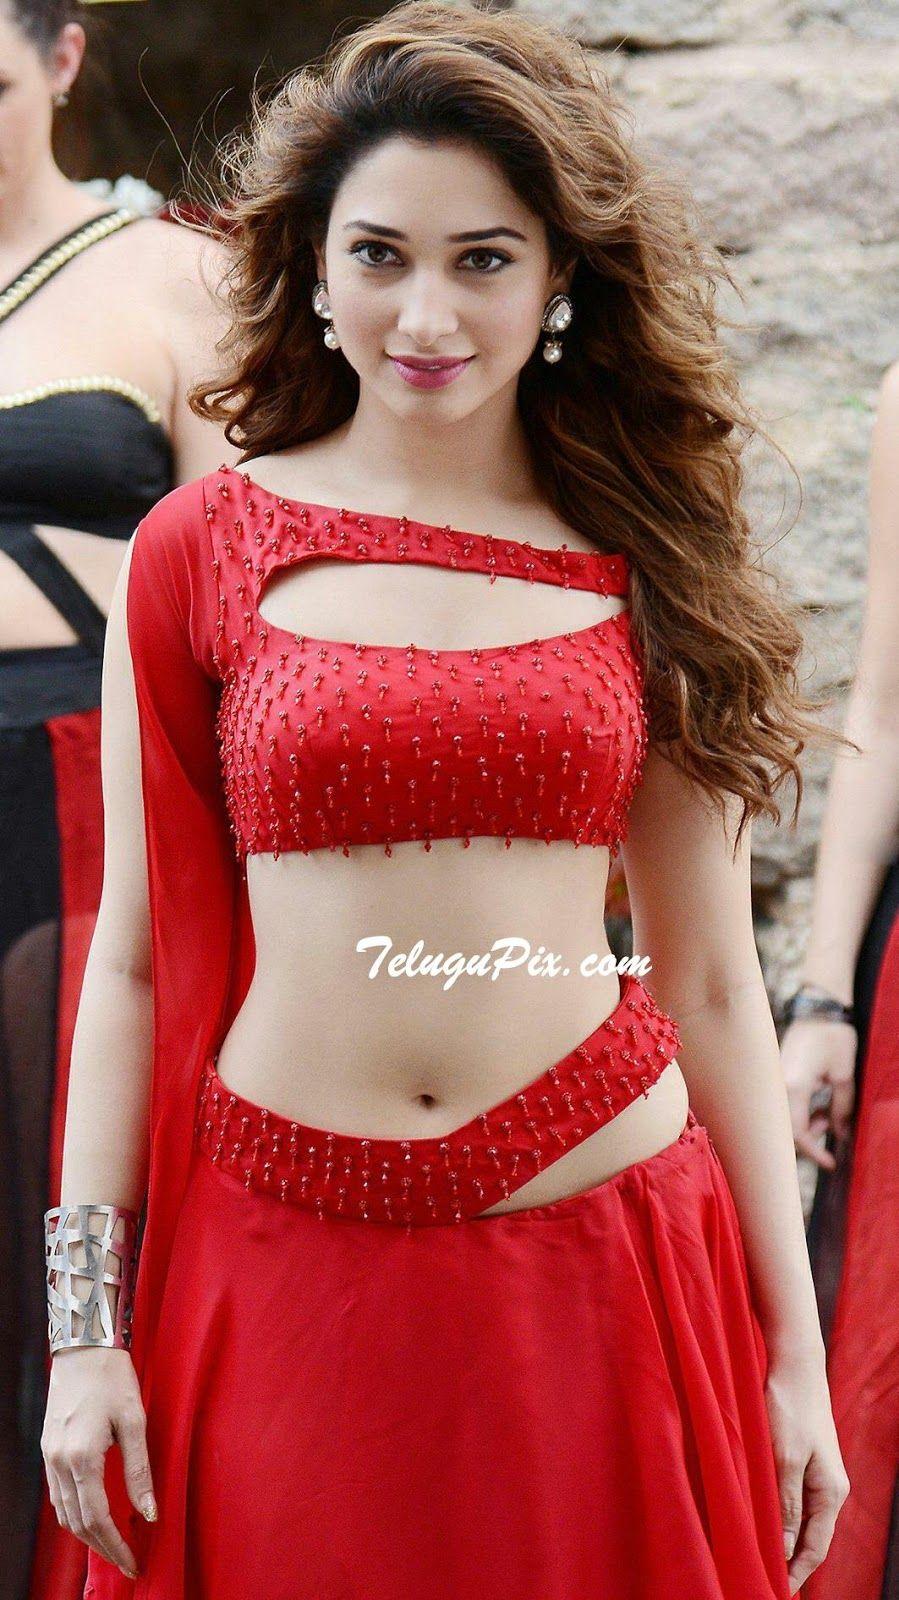 38 Tamanna Bhatia Sexiest Navel And Waist Photos Hottest Most Enjoyable Actresses Photo Most Beautiful Indian Actress Indian Women Beautiful Indian Actress